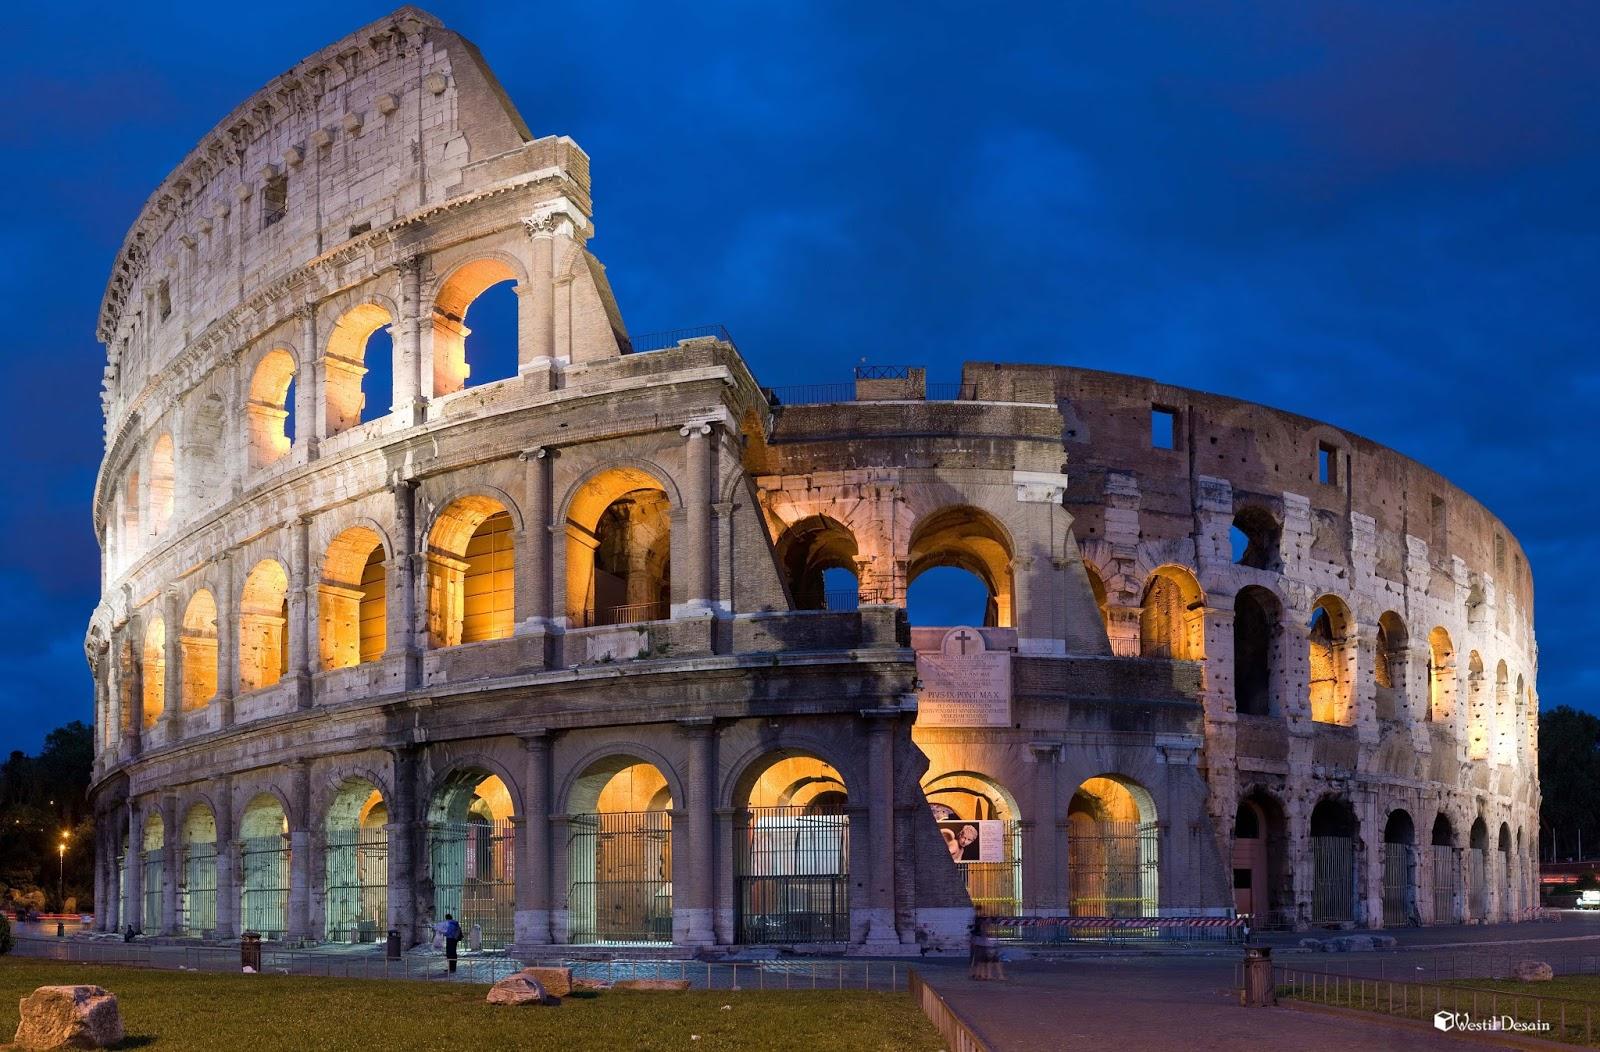 sejarah arsitektur mediterania westil desain